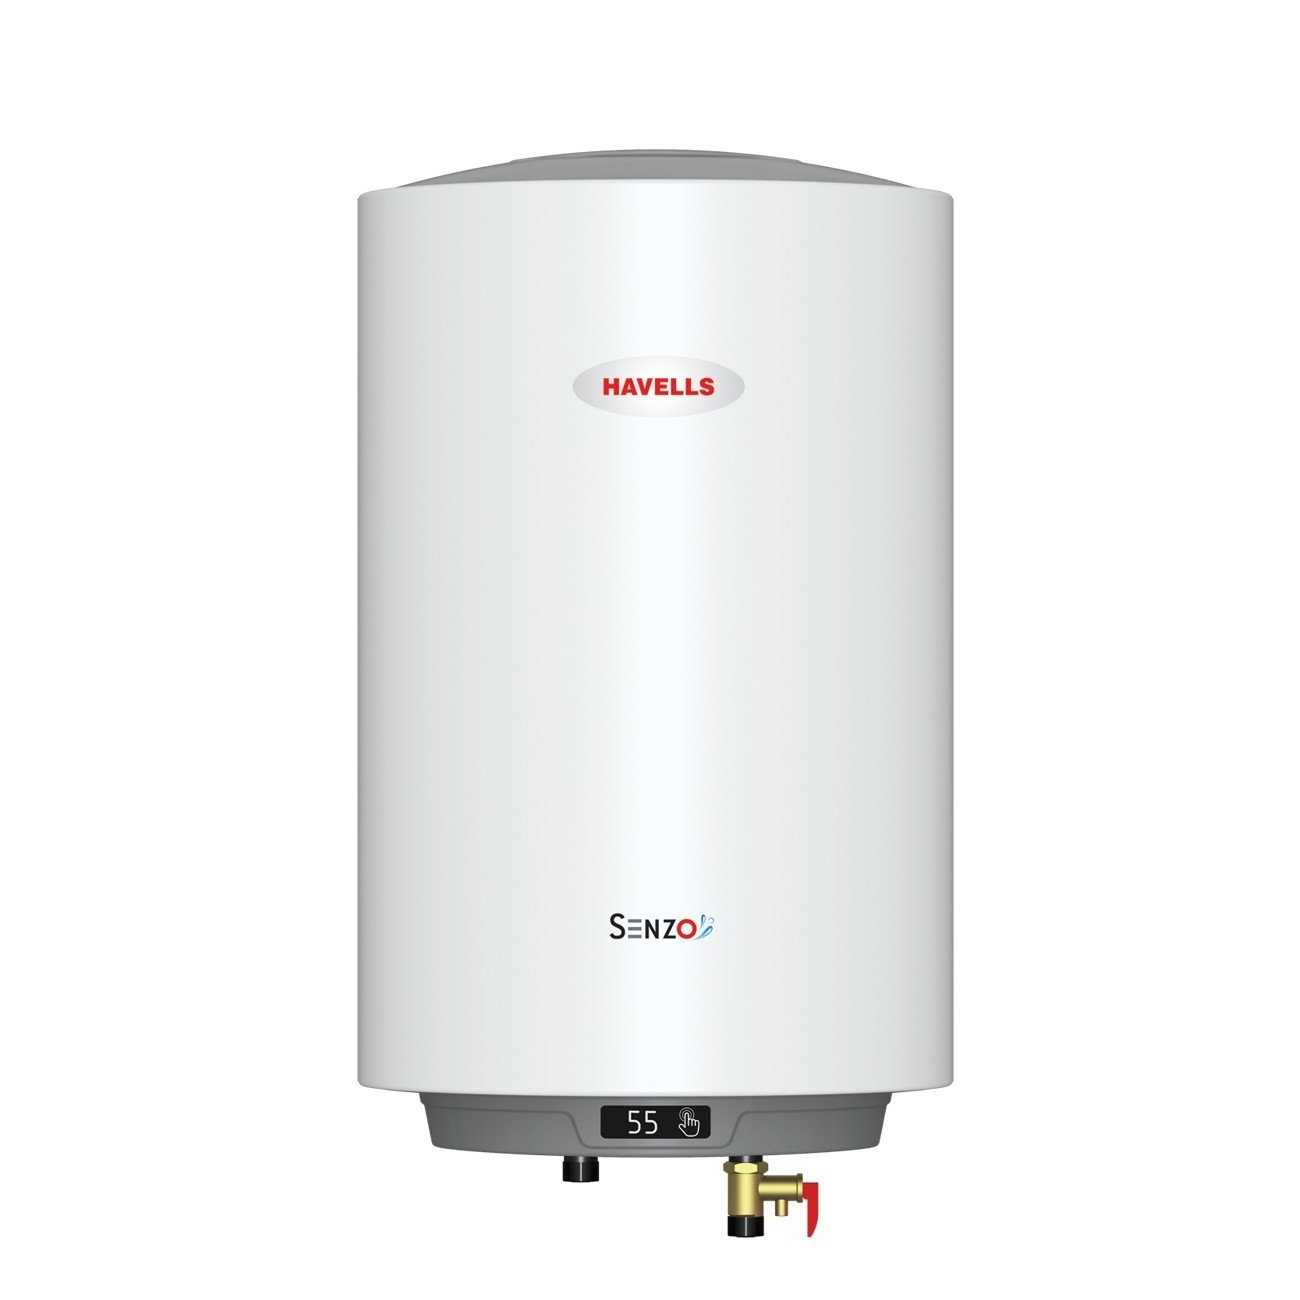 Havells Senzo 25 Litre Storage Water Heater